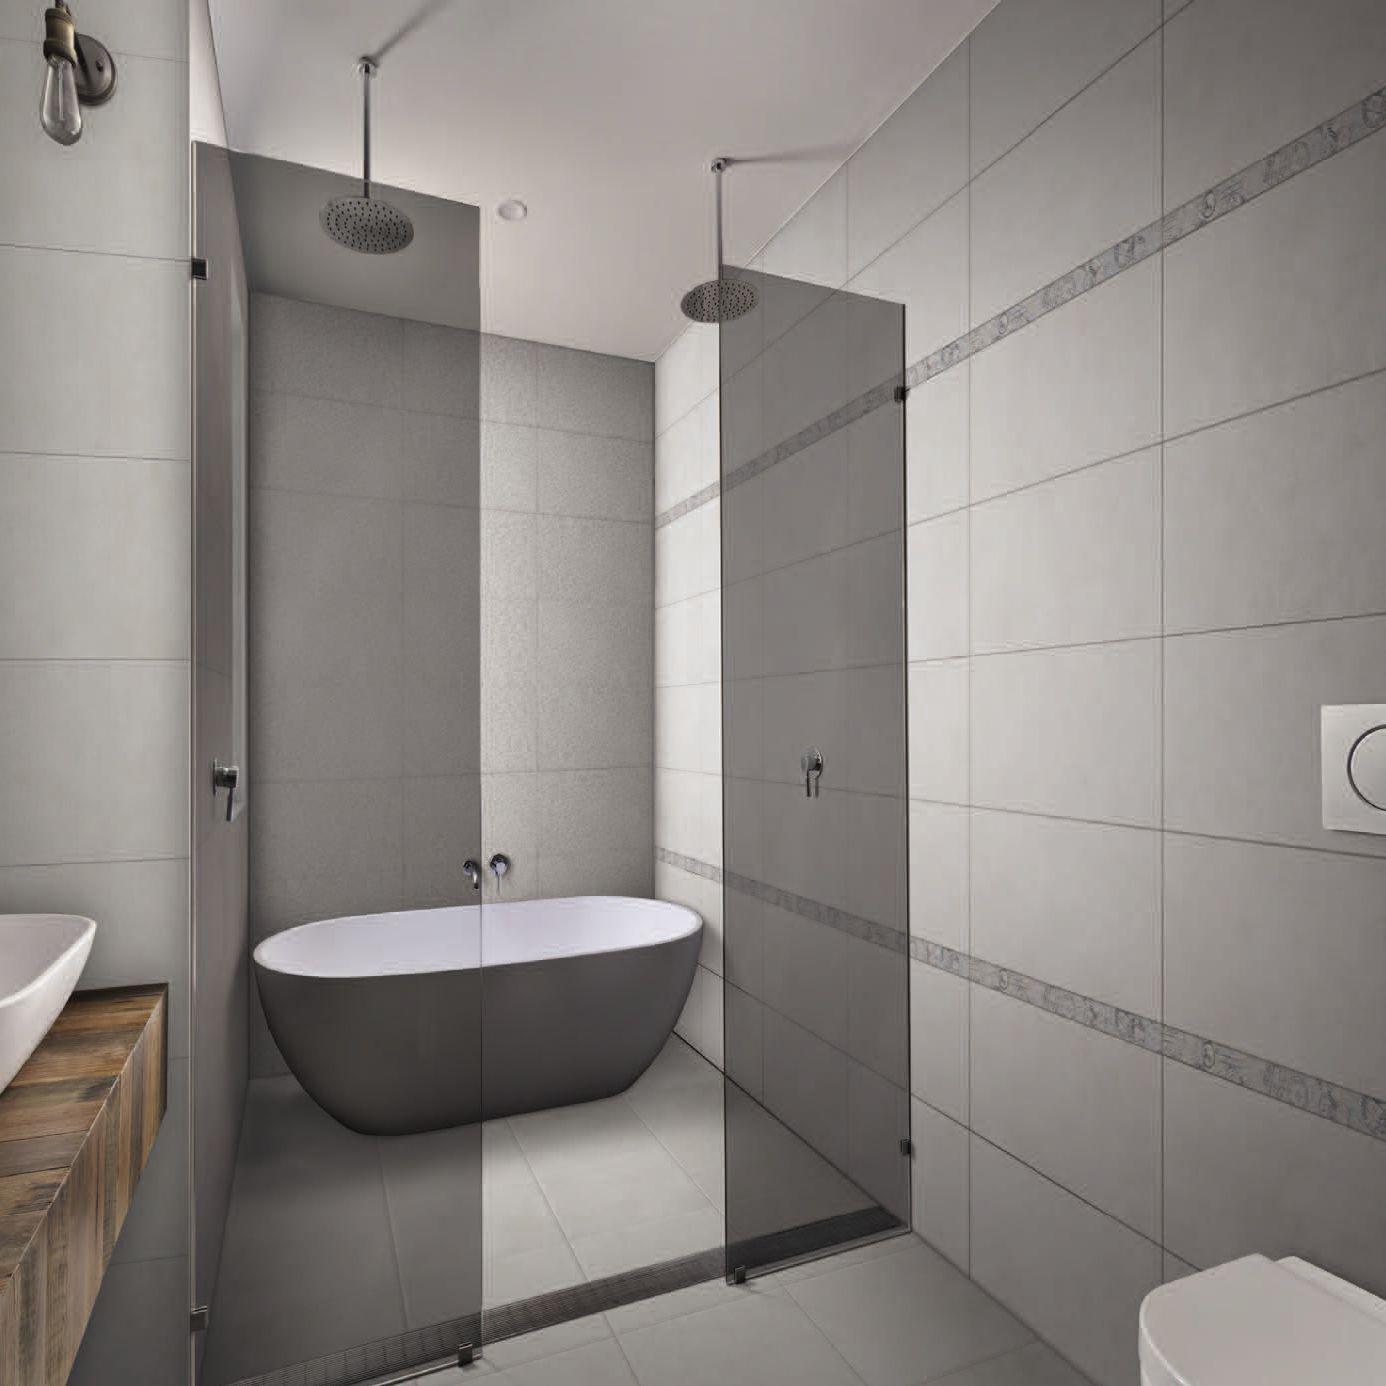 Baldosa para baño / de pared / de suelo / de cerámica - CEMEX ...